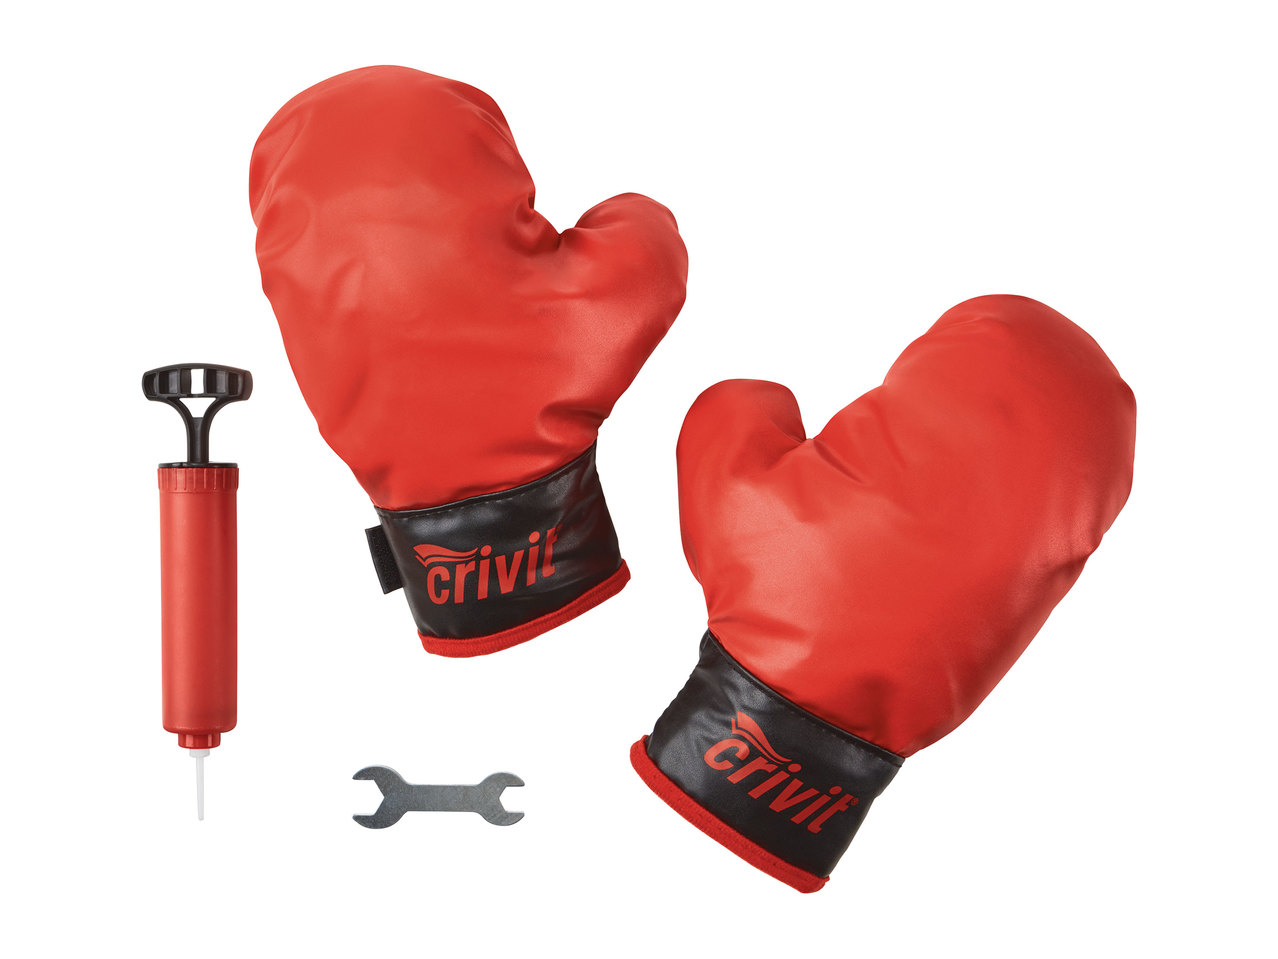 Crivit Kids Play Boxing Set Punch Bag Gloves